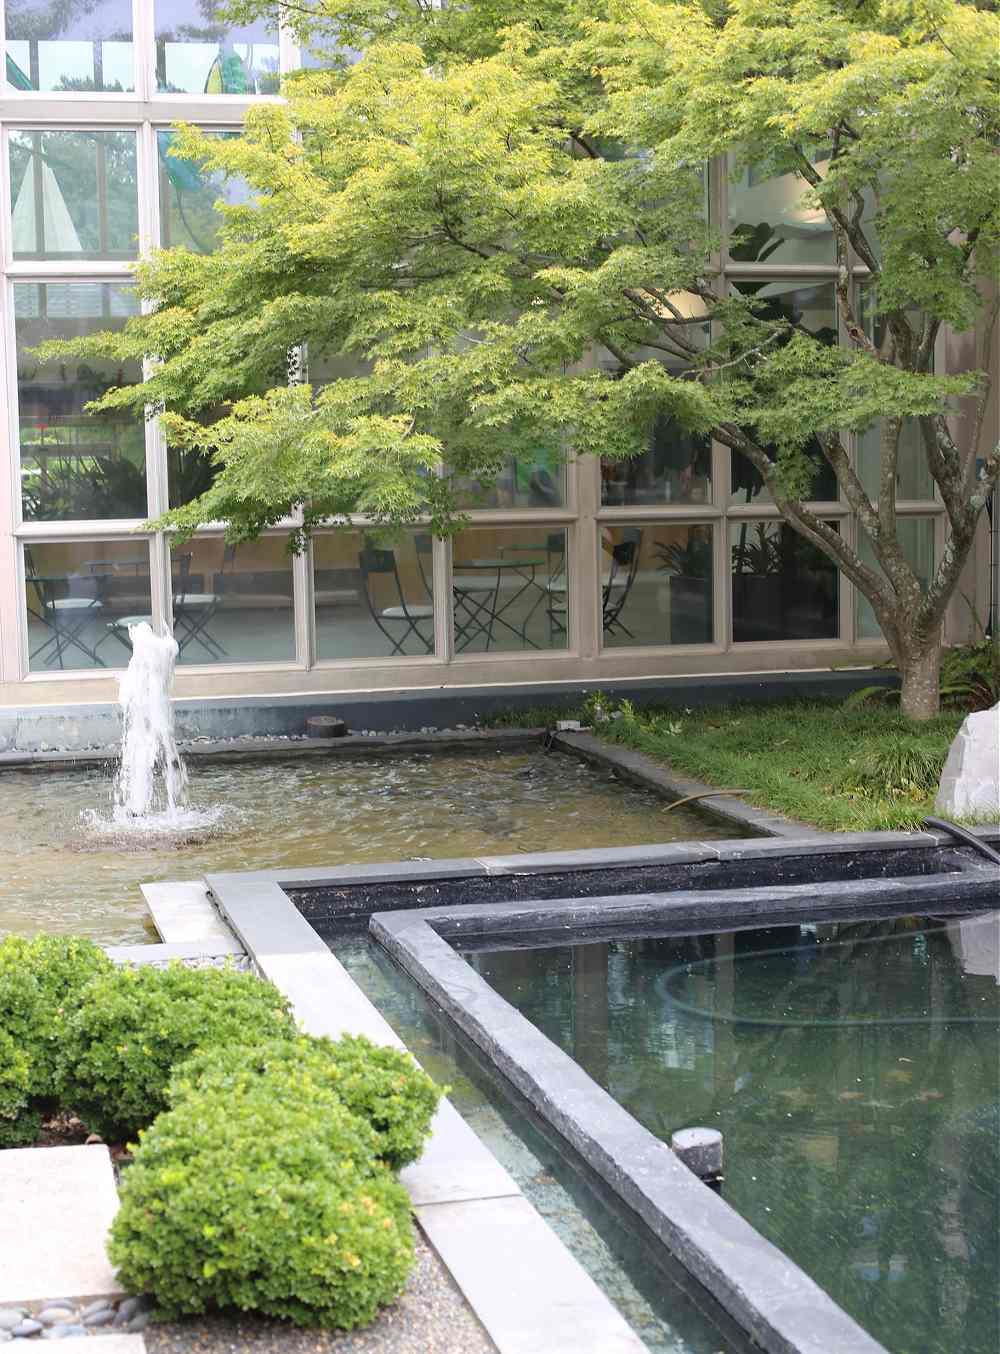 Water garden scene with trees.